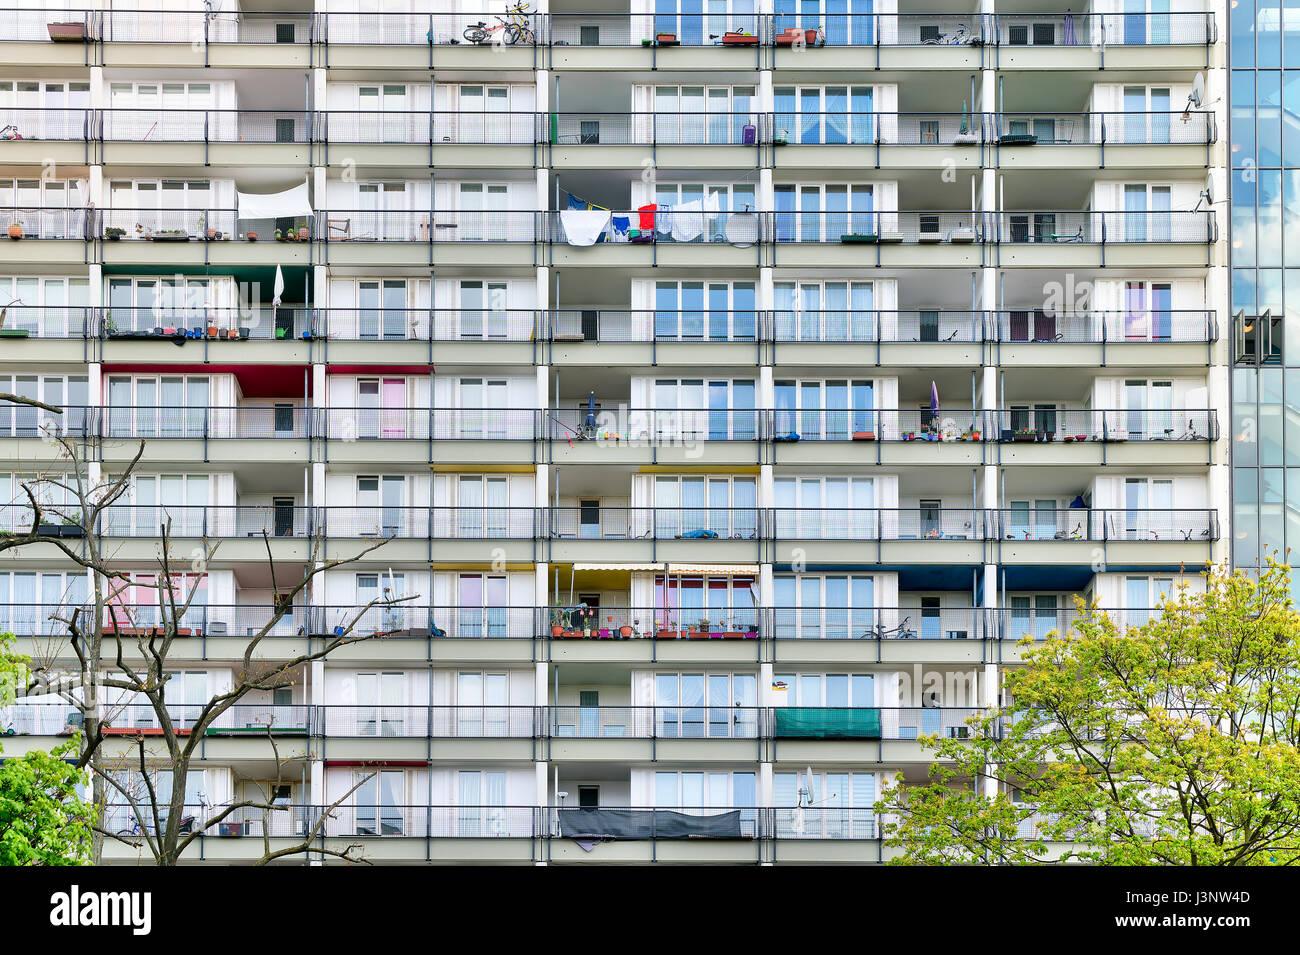 social housing, details of a skyscraper in Berlin - Stock Image